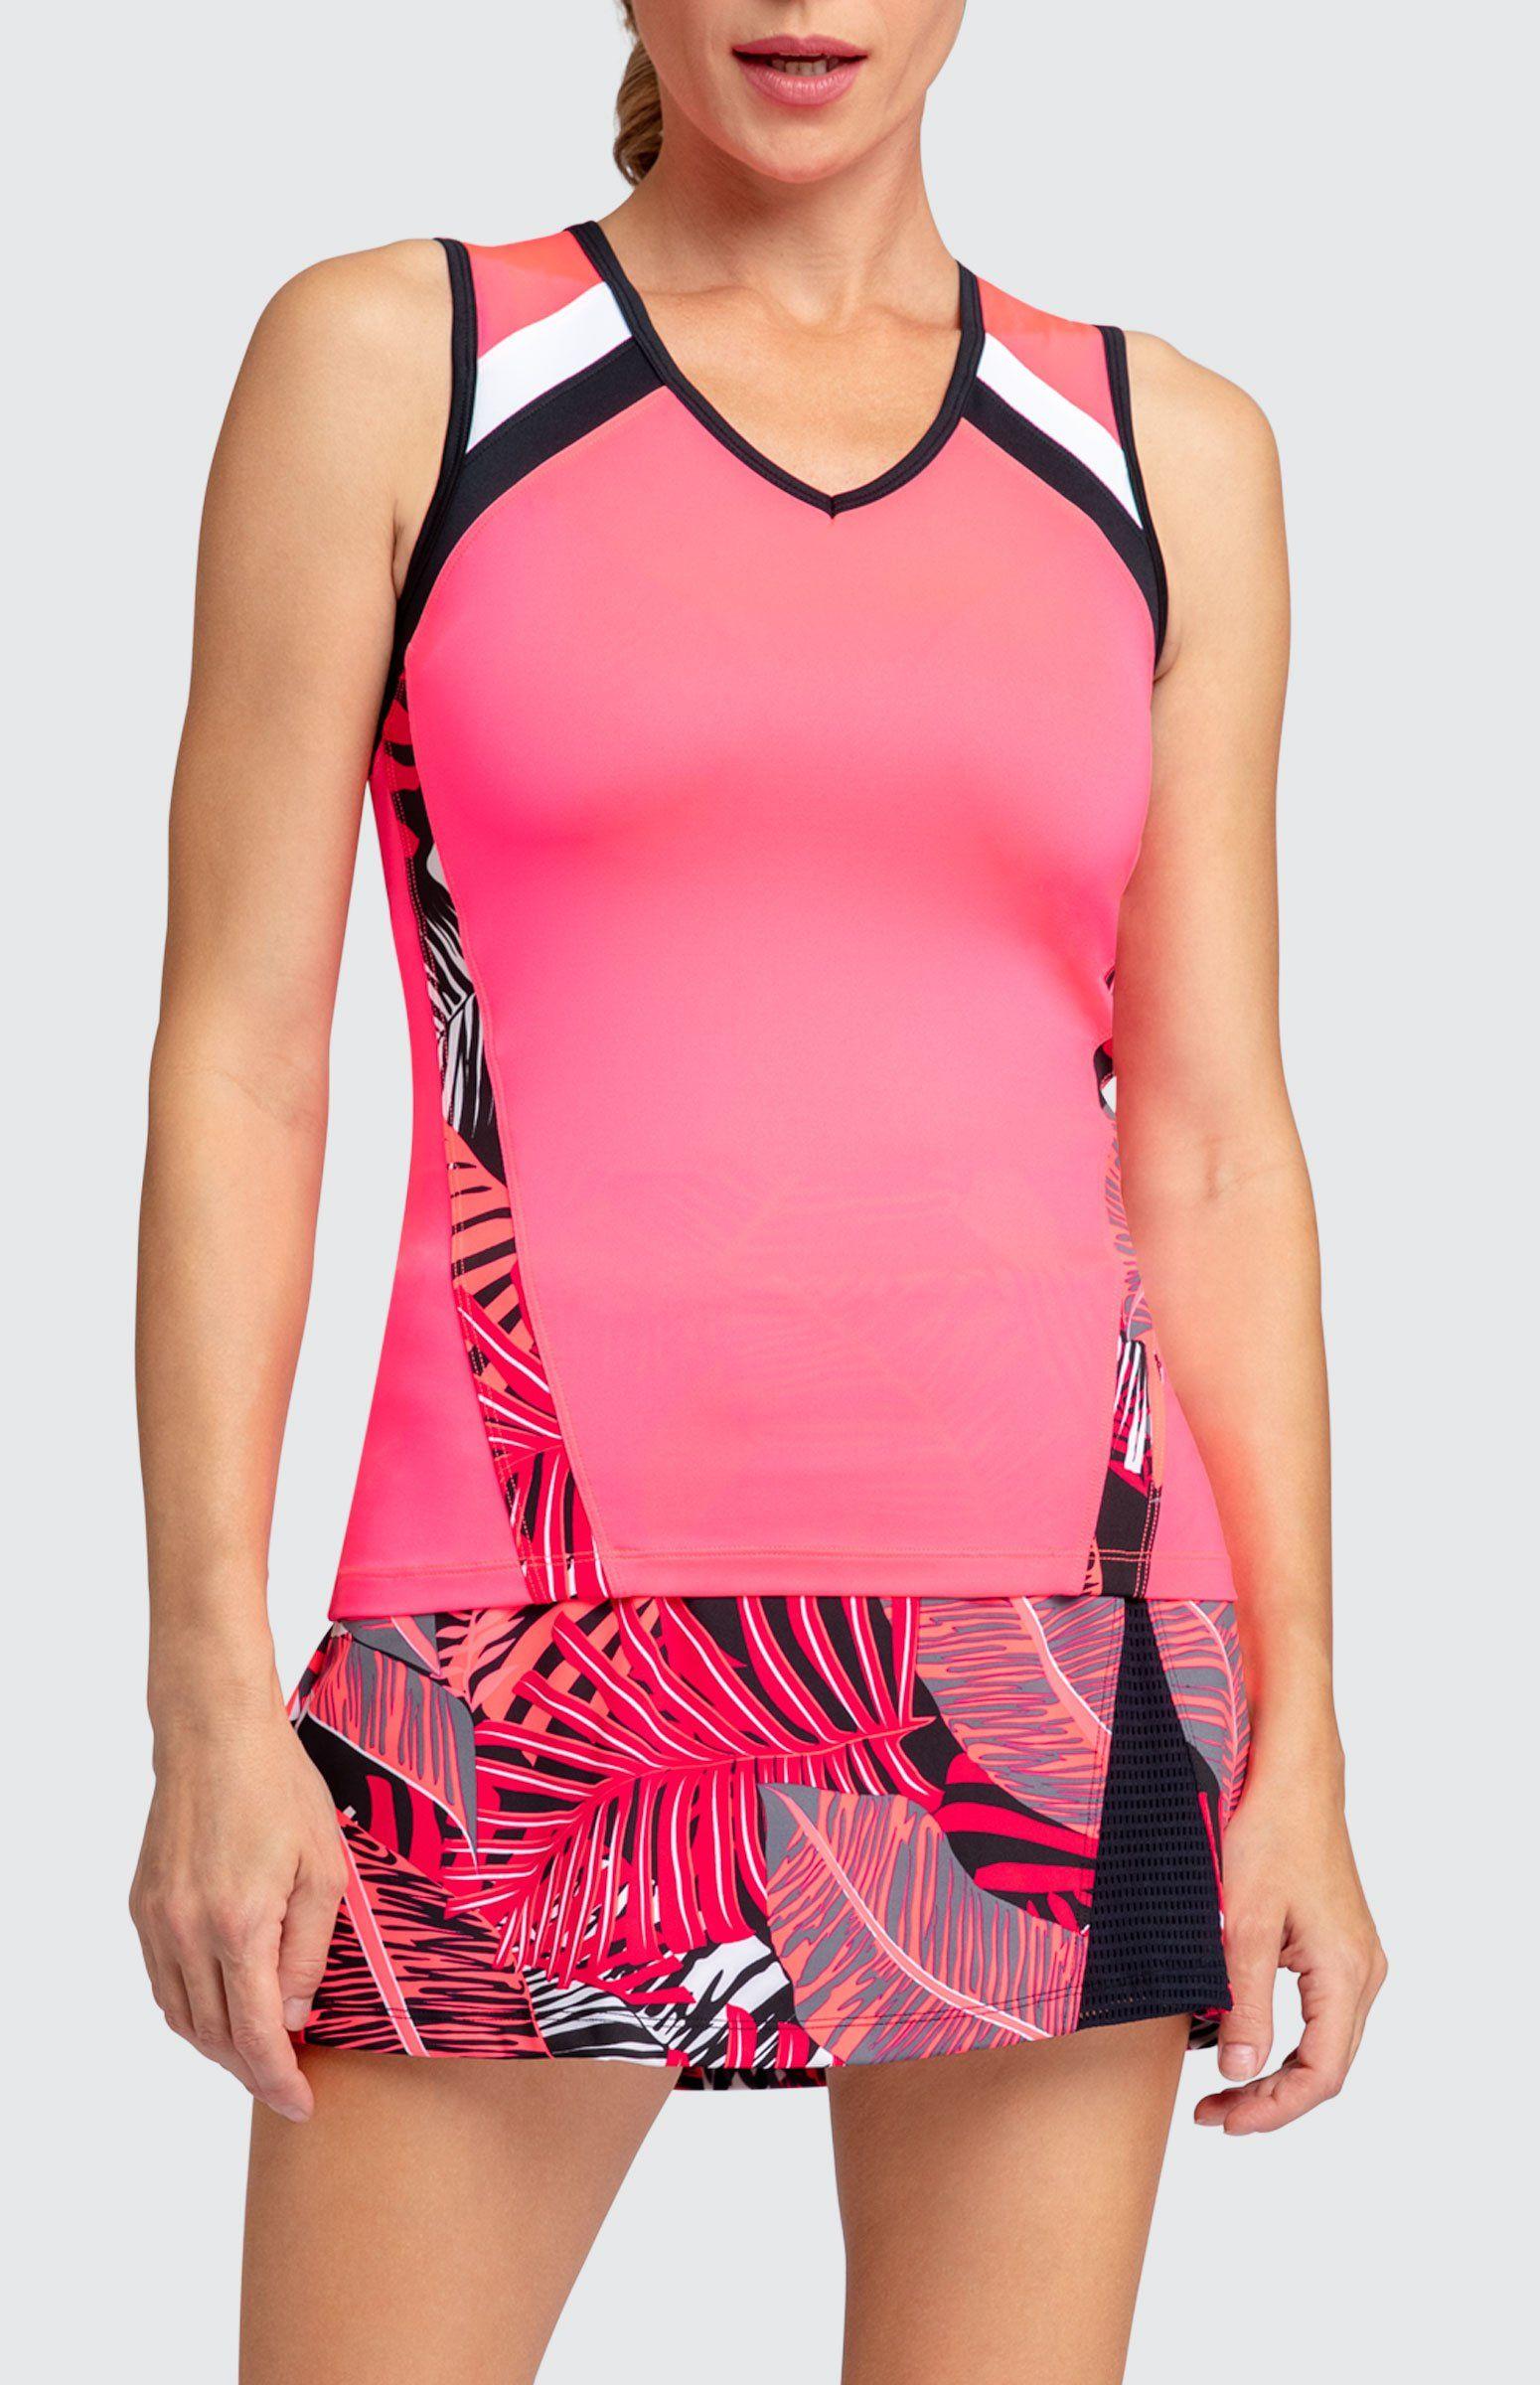 Holland Tank Tropic Sunrise For Tennis Tail Activewear Women S Tennis Fashion Apparel Womens Tennis Fashion Tail Activewear Active Wear For Women